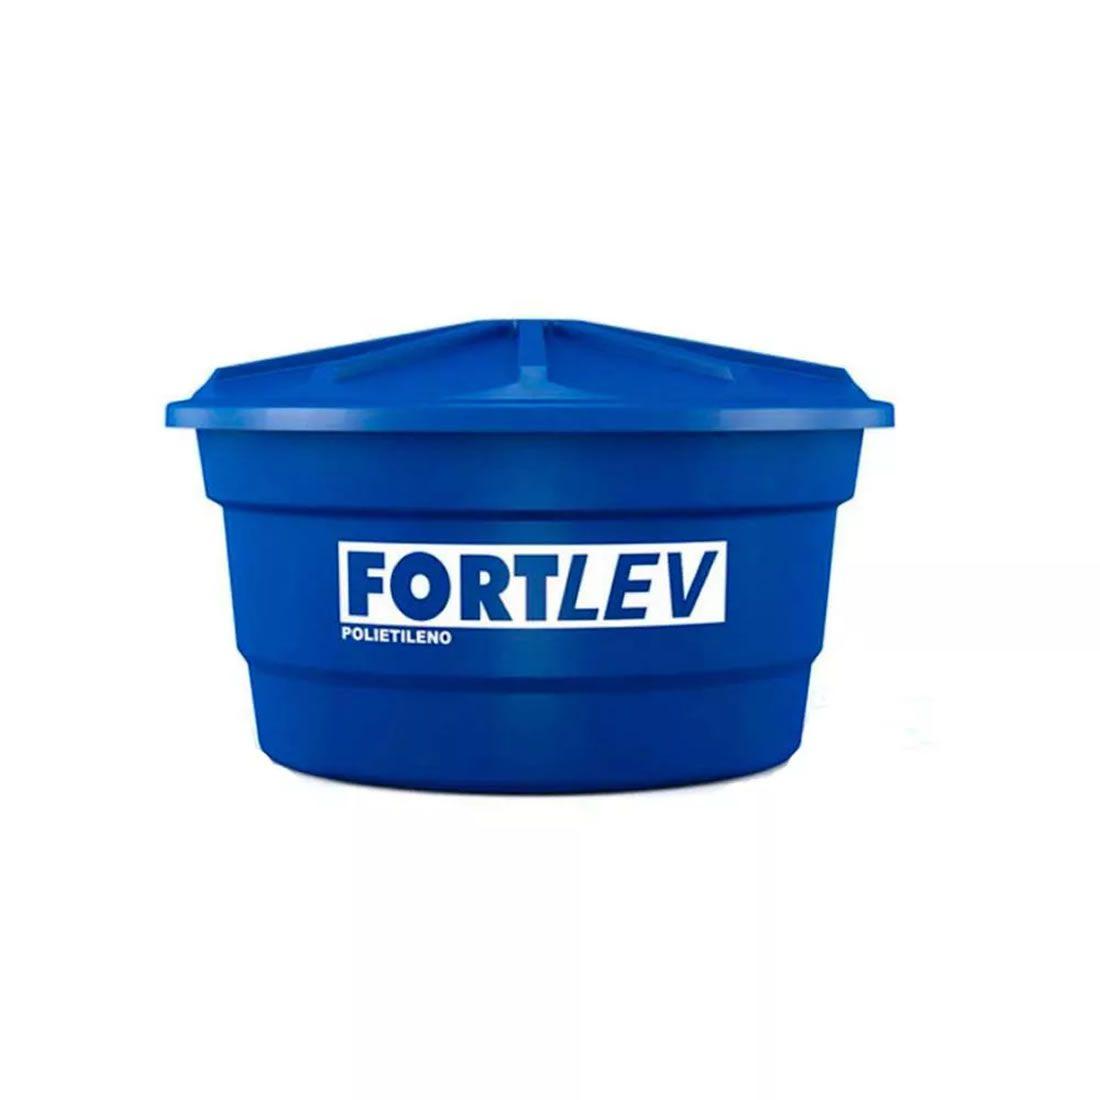 Caixa D'água 310 Litros Polietileno Fortlev